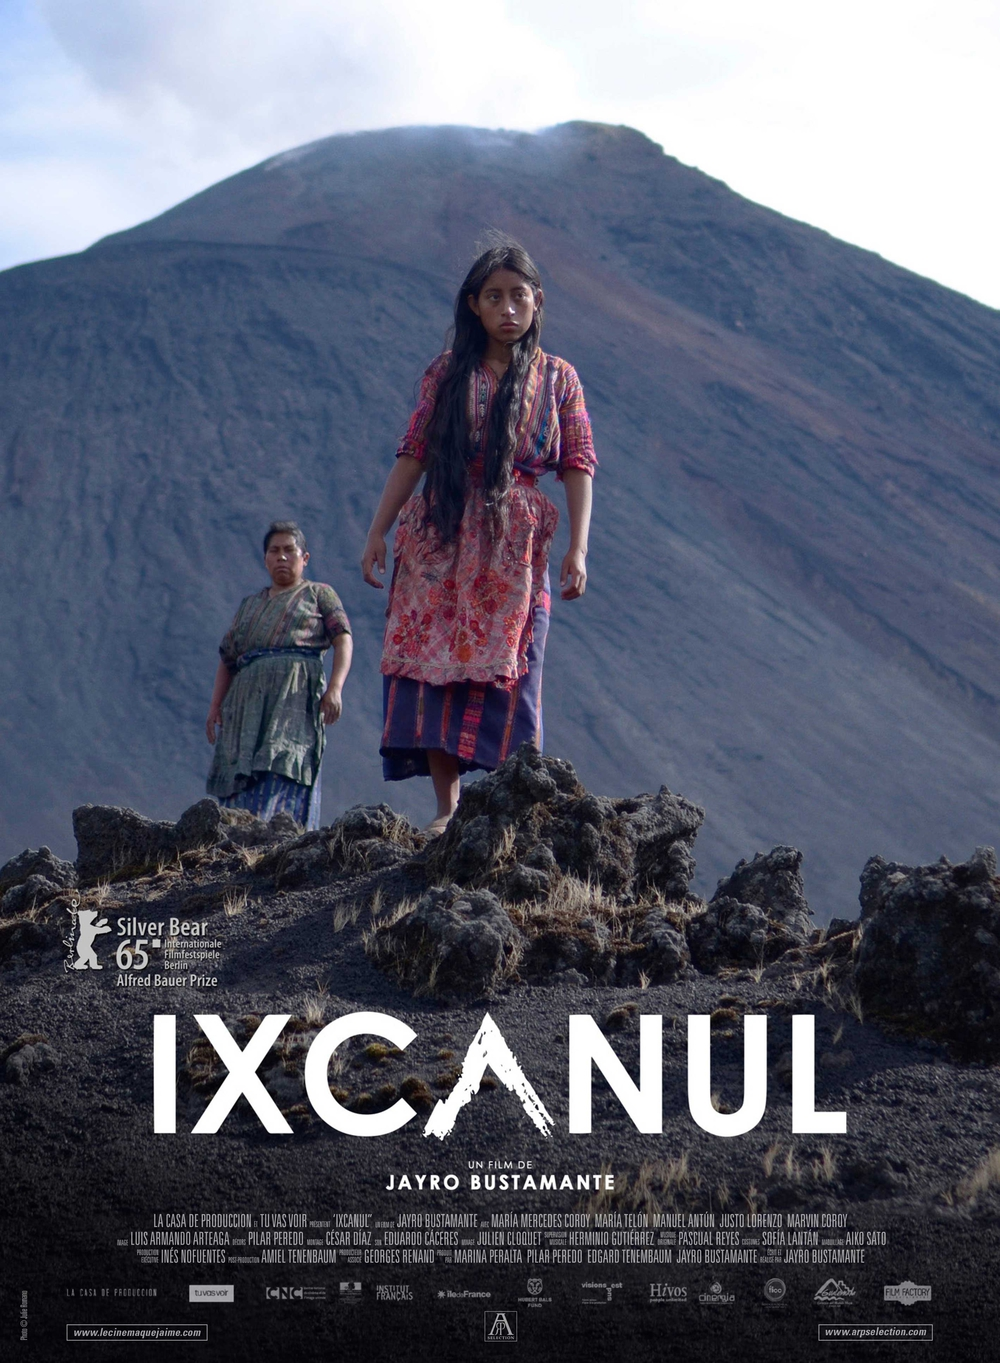 ixcanul-poster-vulcano.jpg